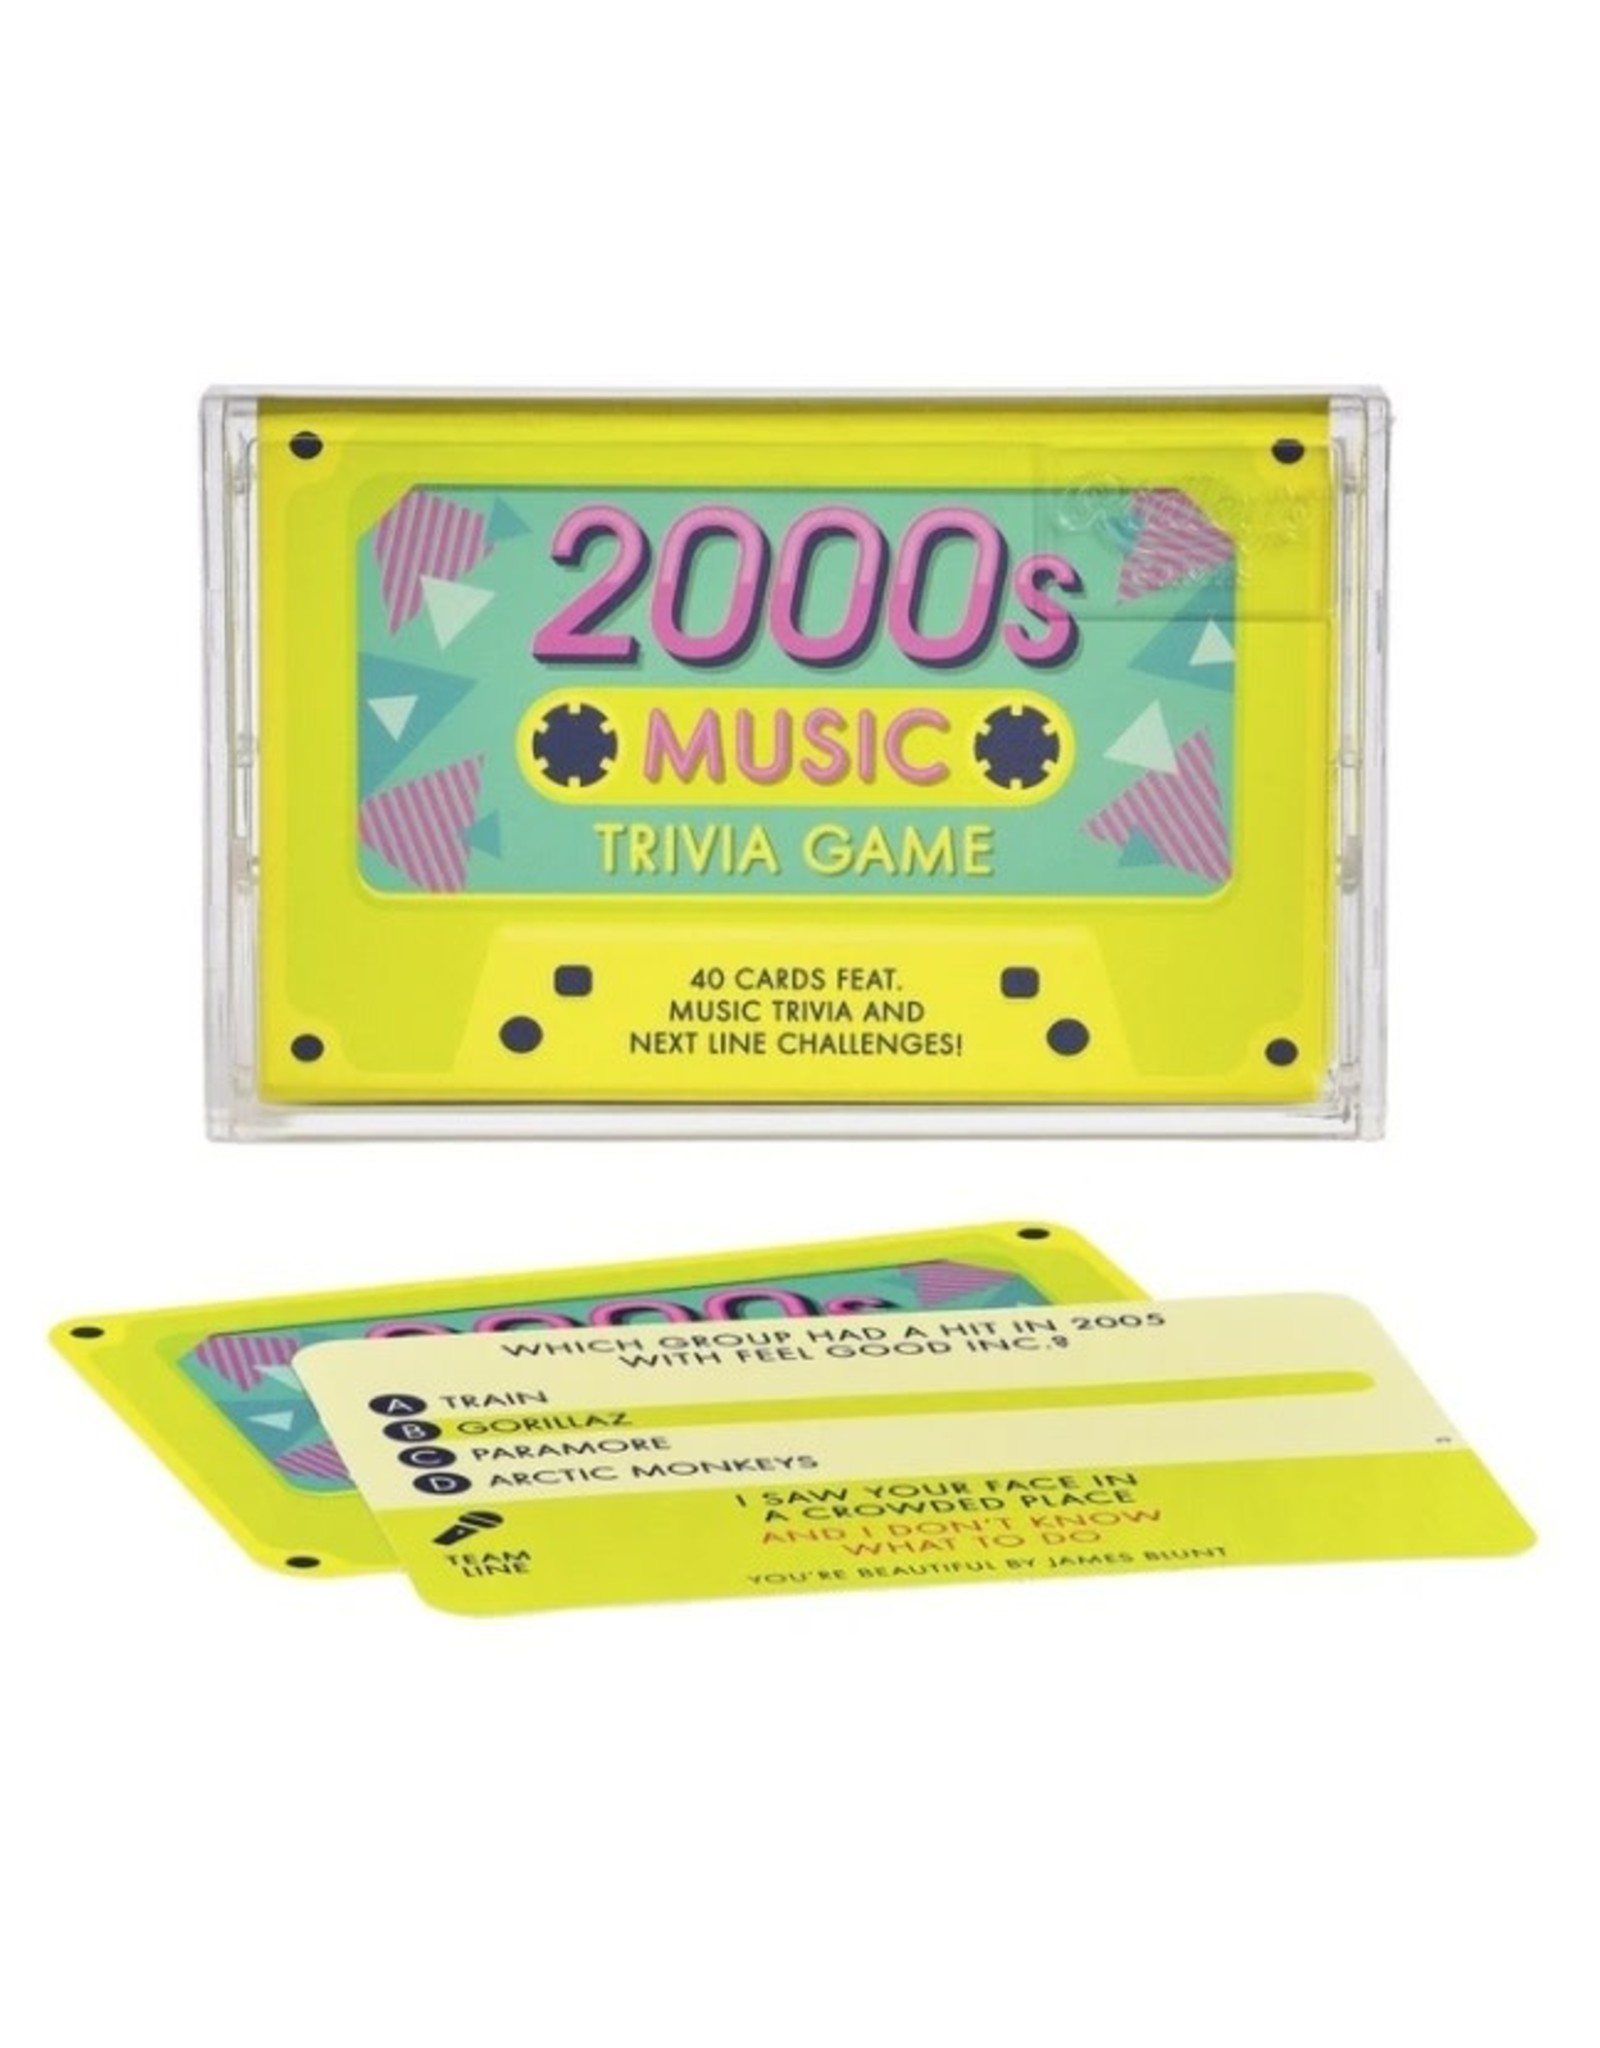 2000's Music Trivia Game